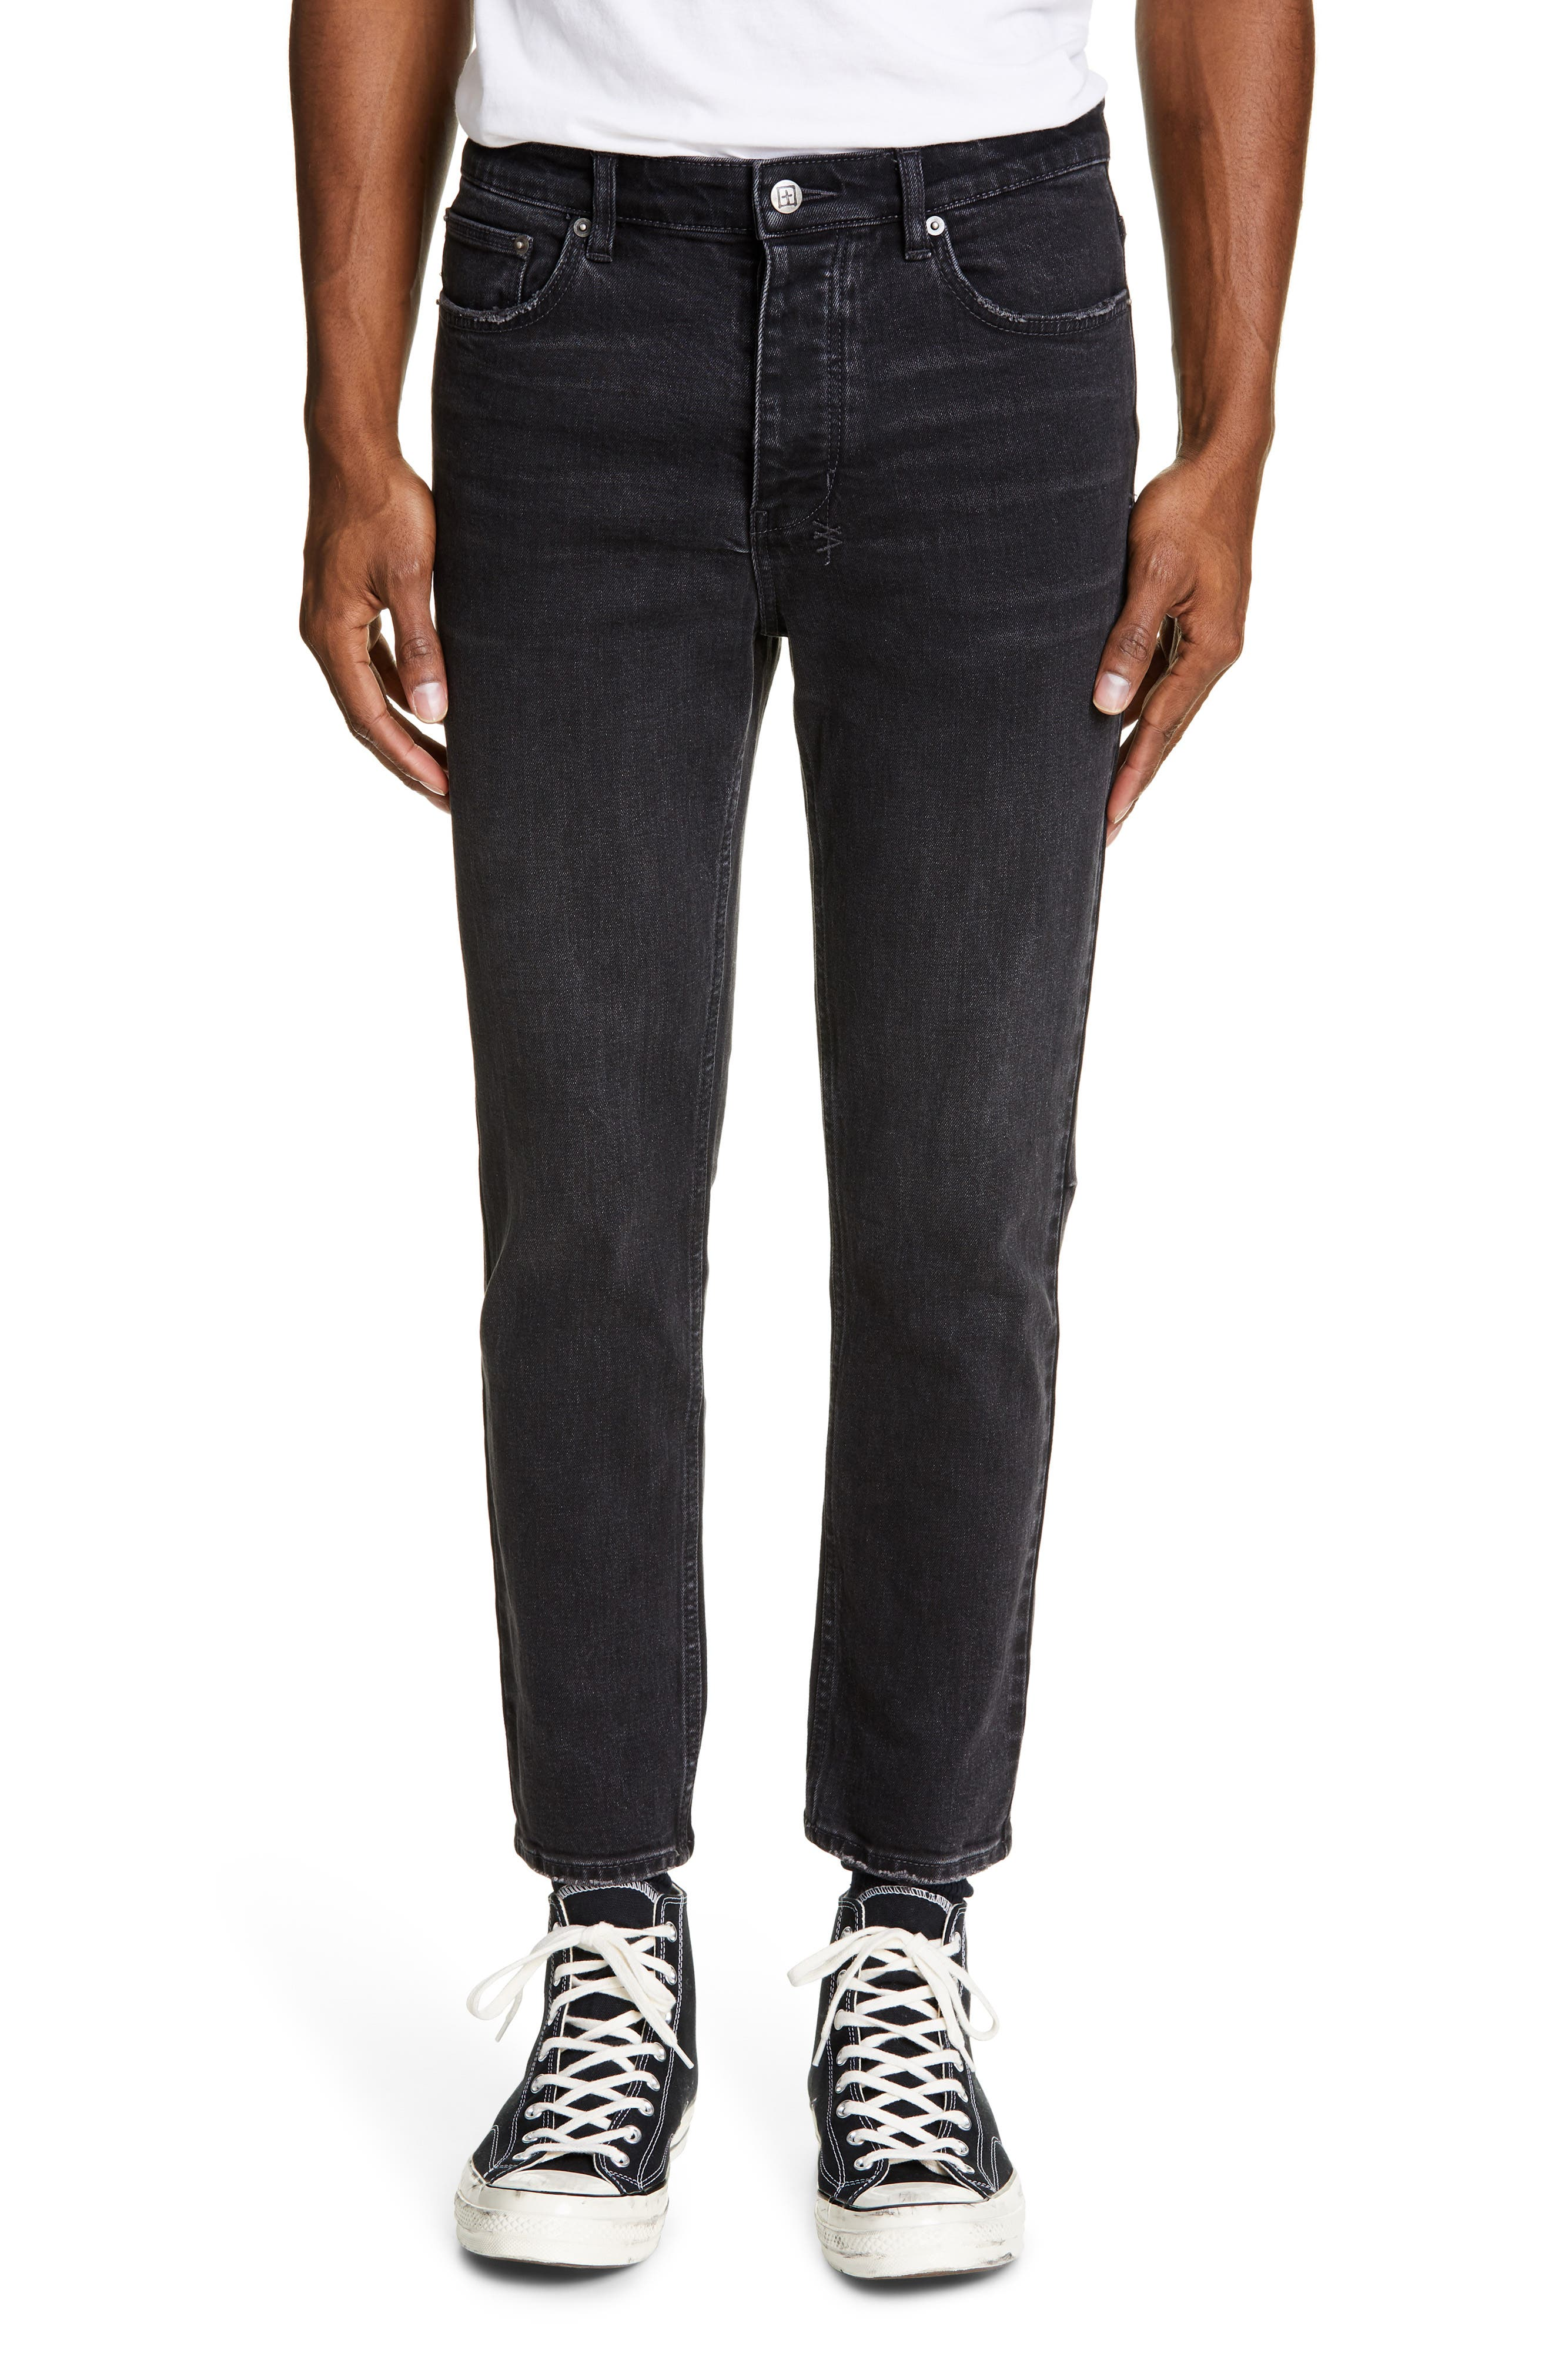 KSUBI, Chitch Hard Rock Skinny Fit Crop Jeans, Main thumbnail 1, color, BLACK